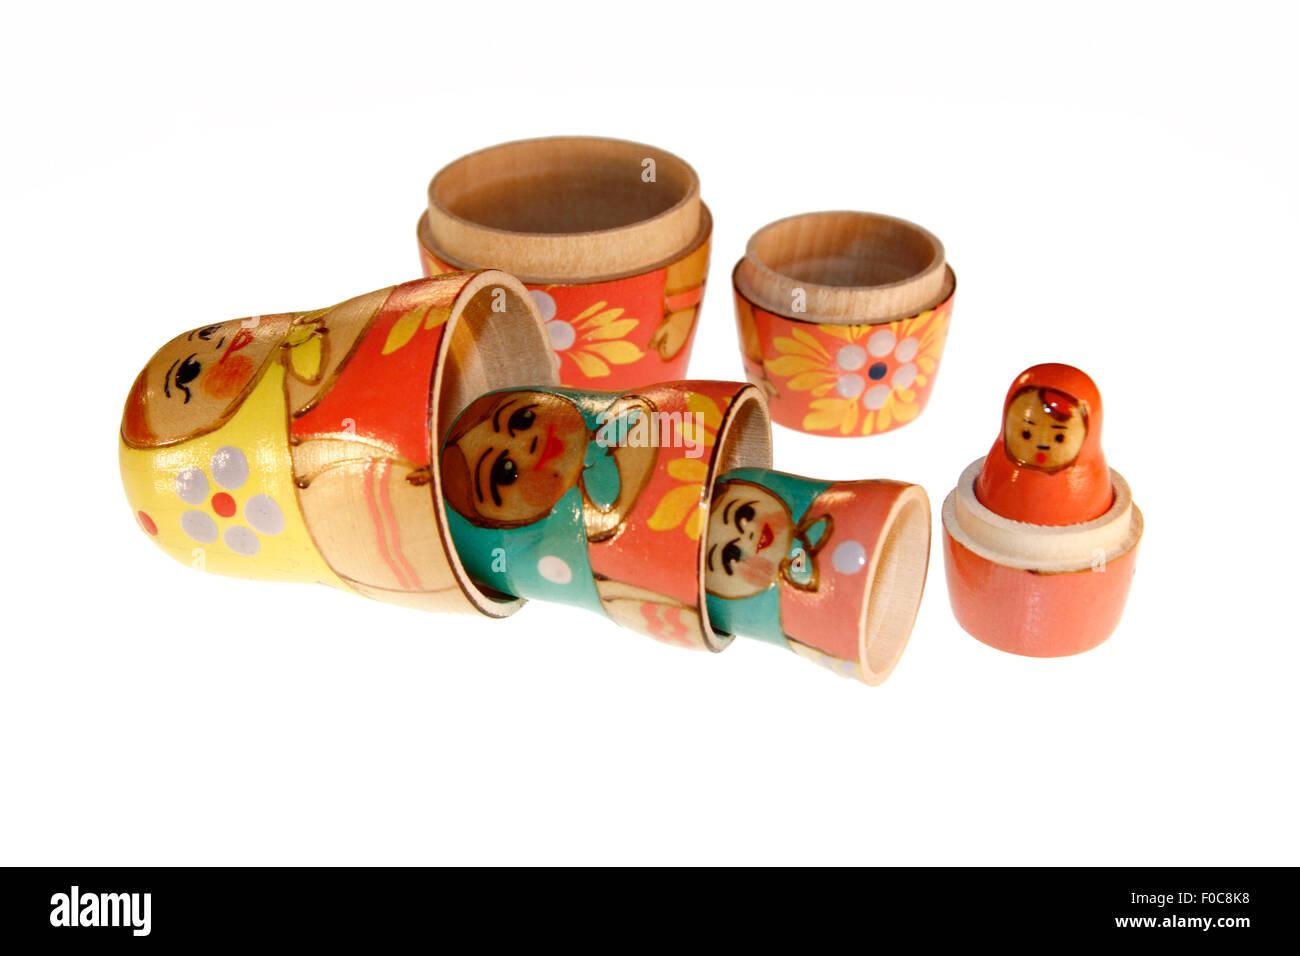 Symbolbild: Matrjoschka/ Matroschka. Stock Photo